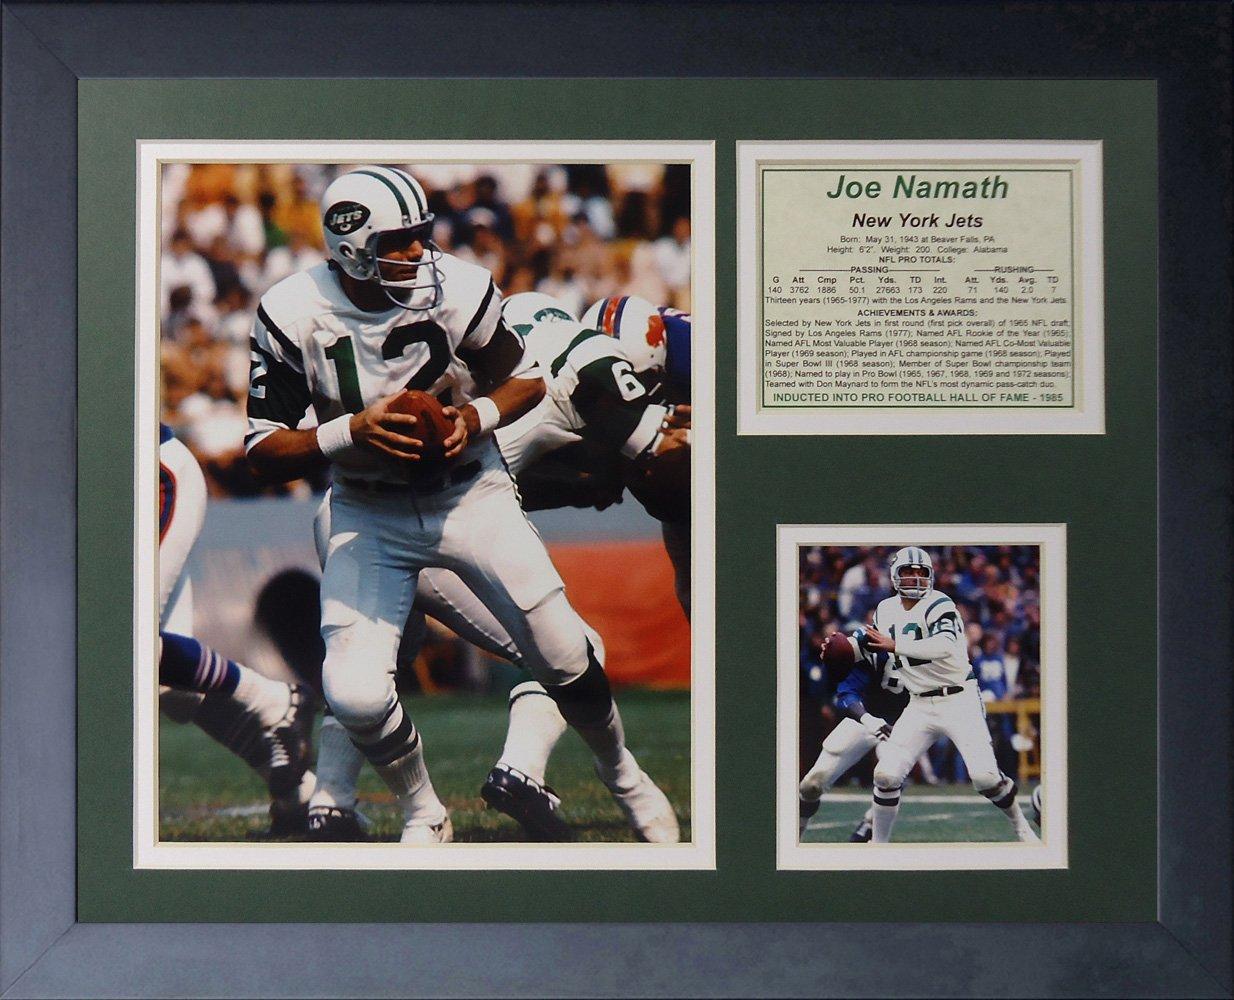 11 x 14-Inch Legends Never Die Joe Namath Home Framed Photo Collage